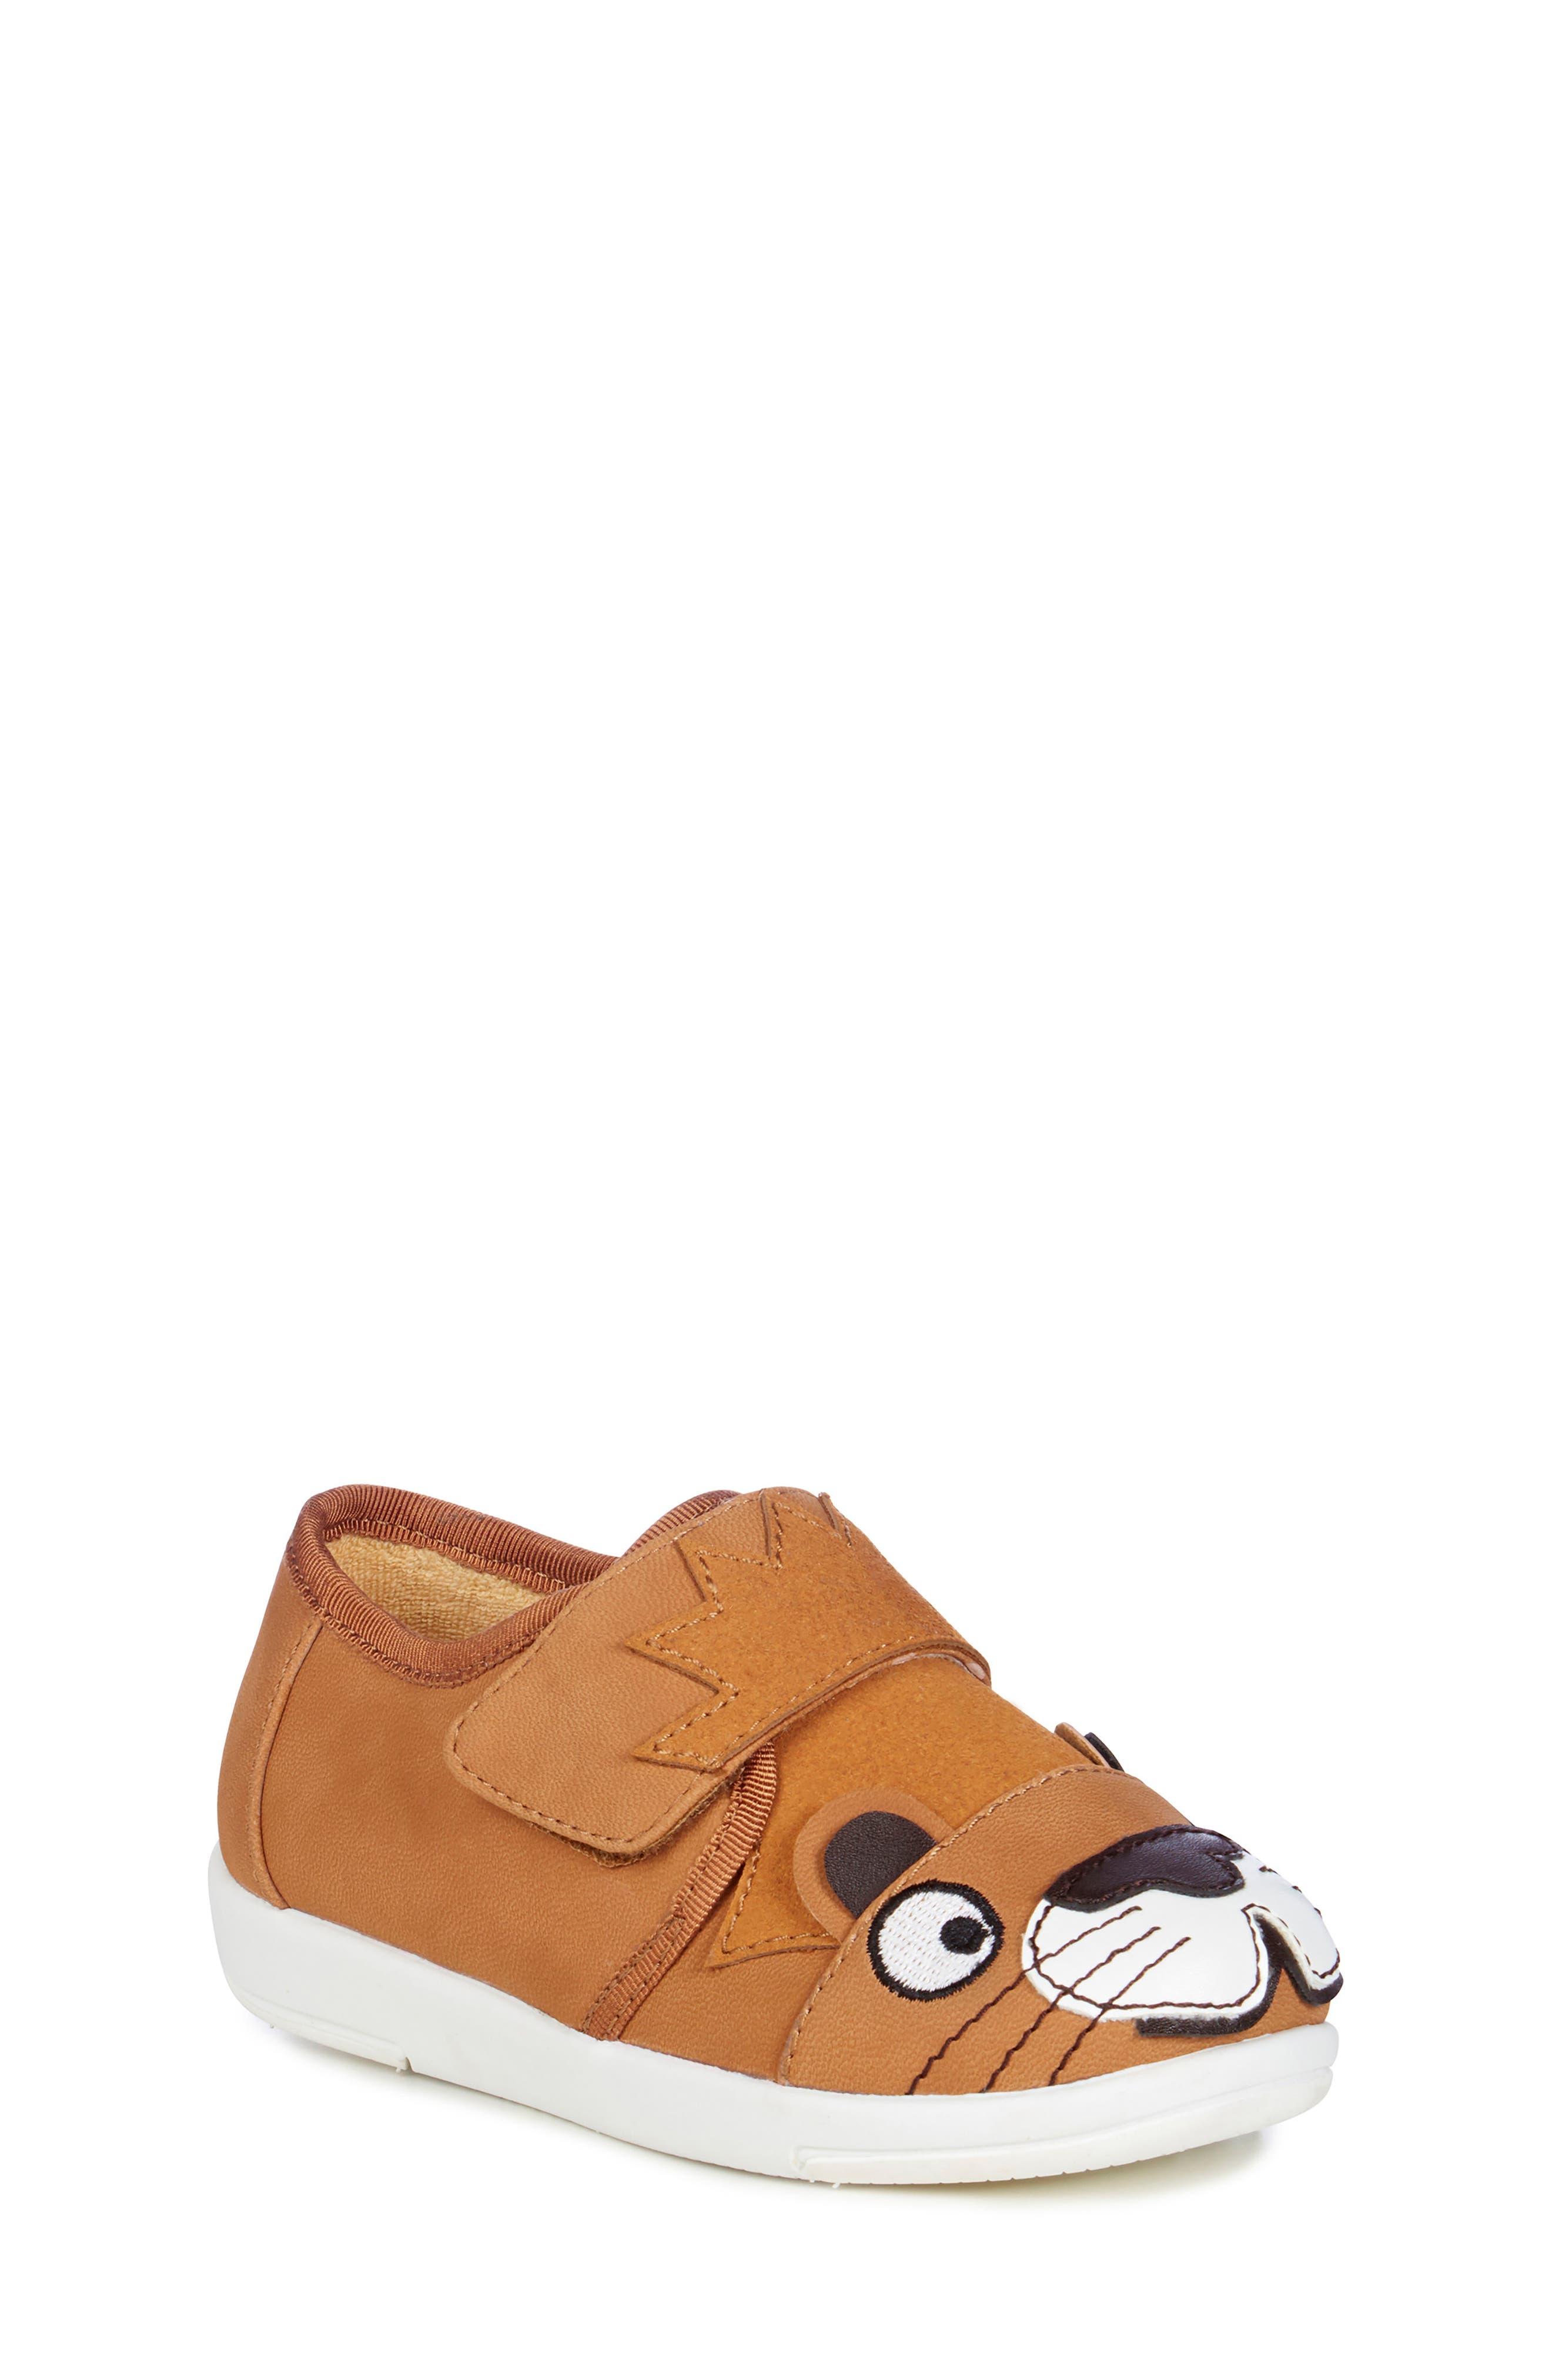 EMU AUSTRALIA Sneaker, Main, color, 200